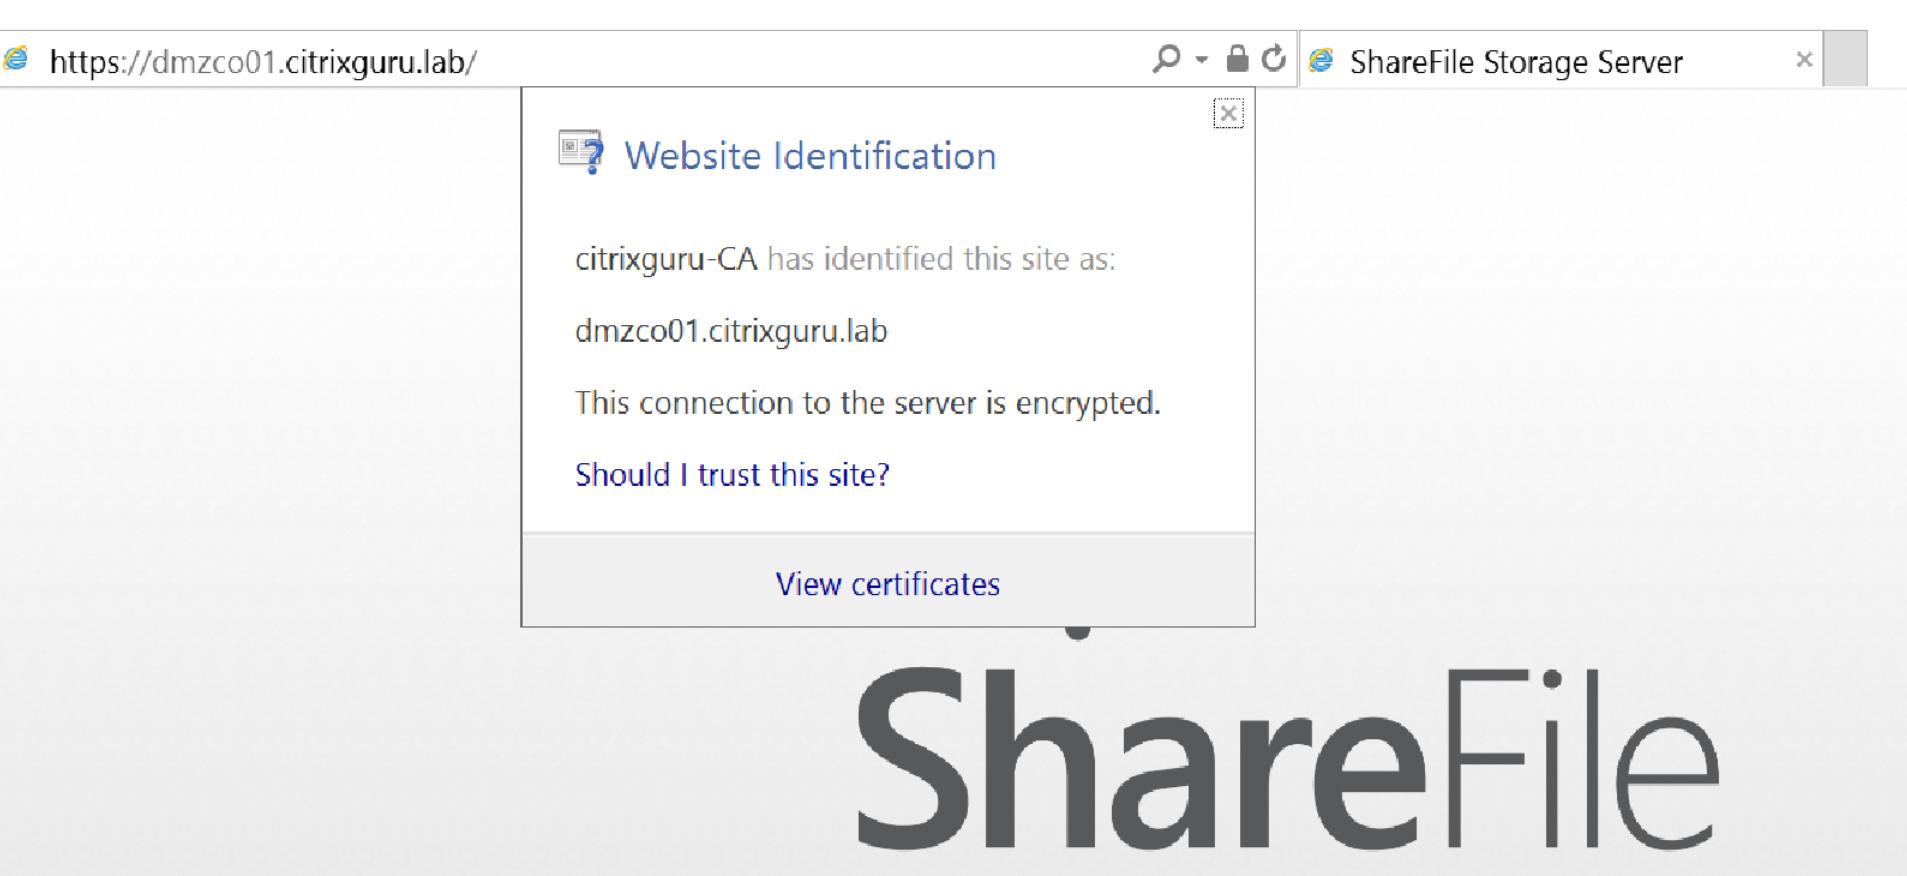 Citrix ShareFile StorageZones Controller - Secured with SSL